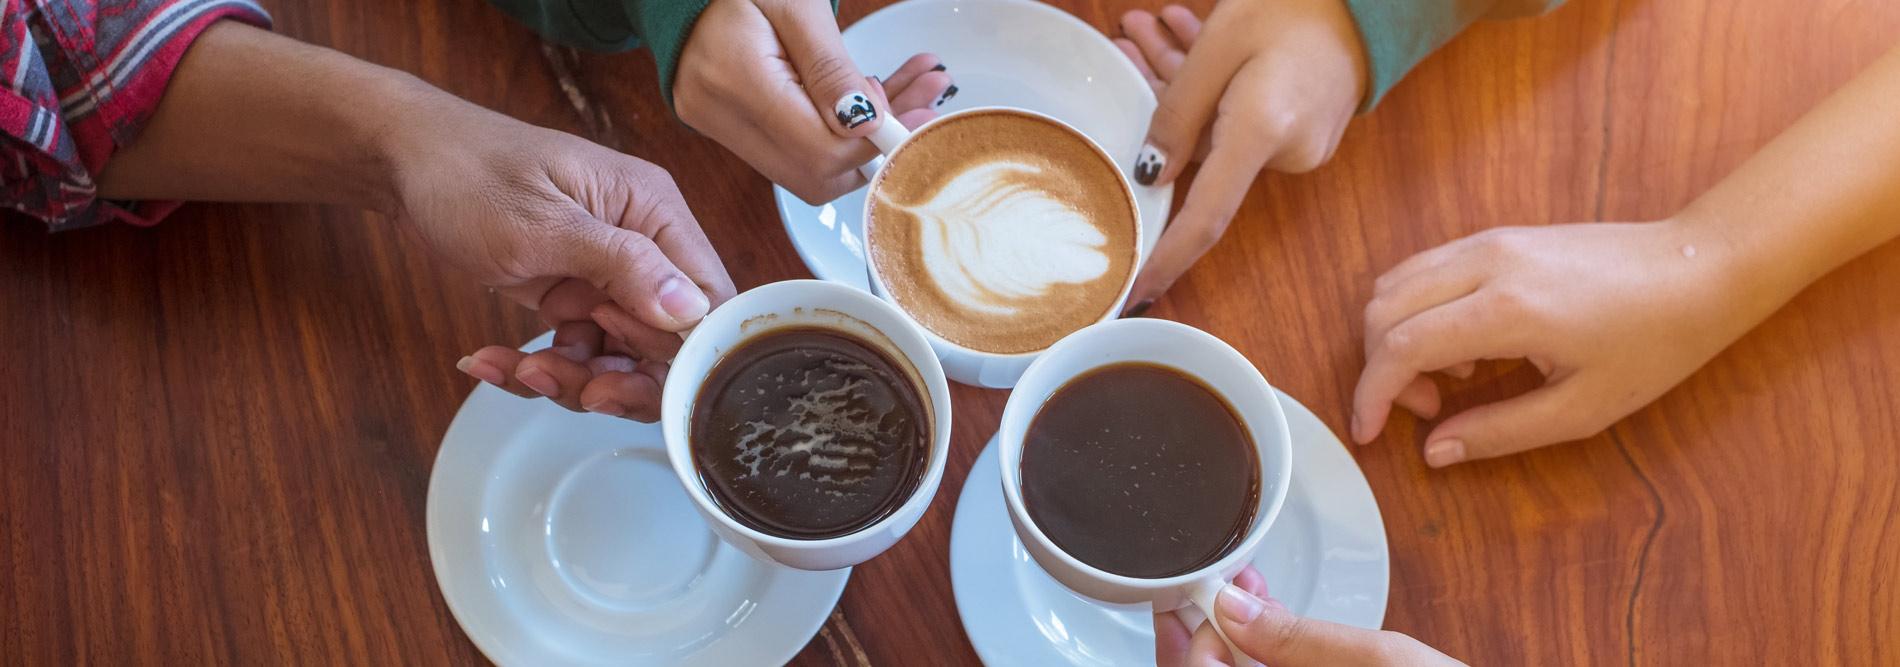 Nivona Kaffee trinken